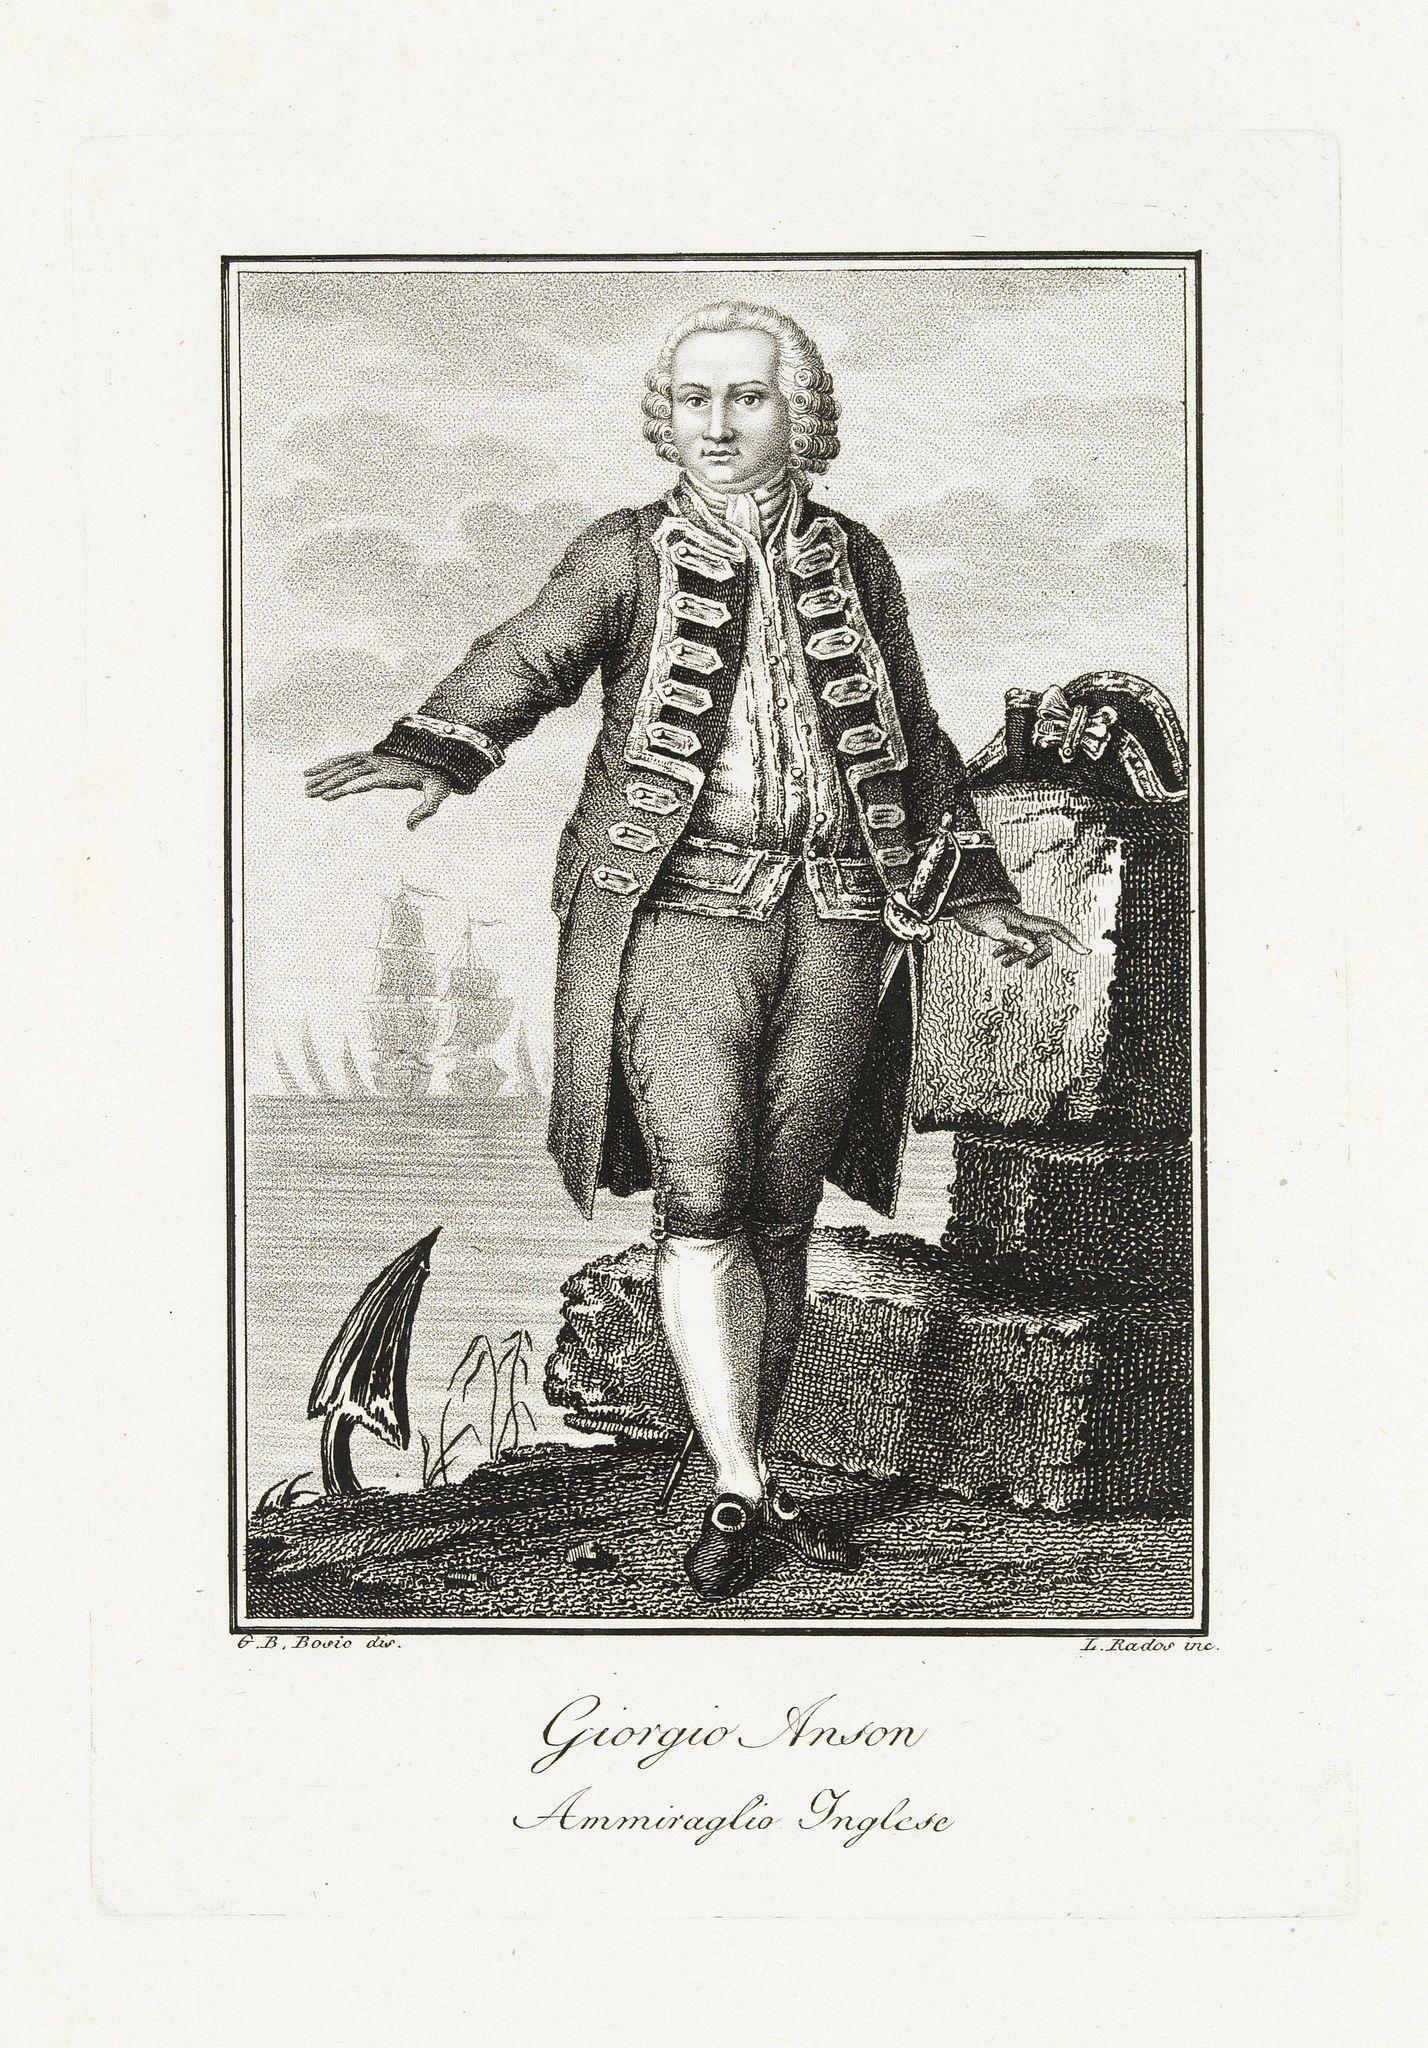 RADOS, L. -  Giorgio Anson Ammiraglio Inglese.